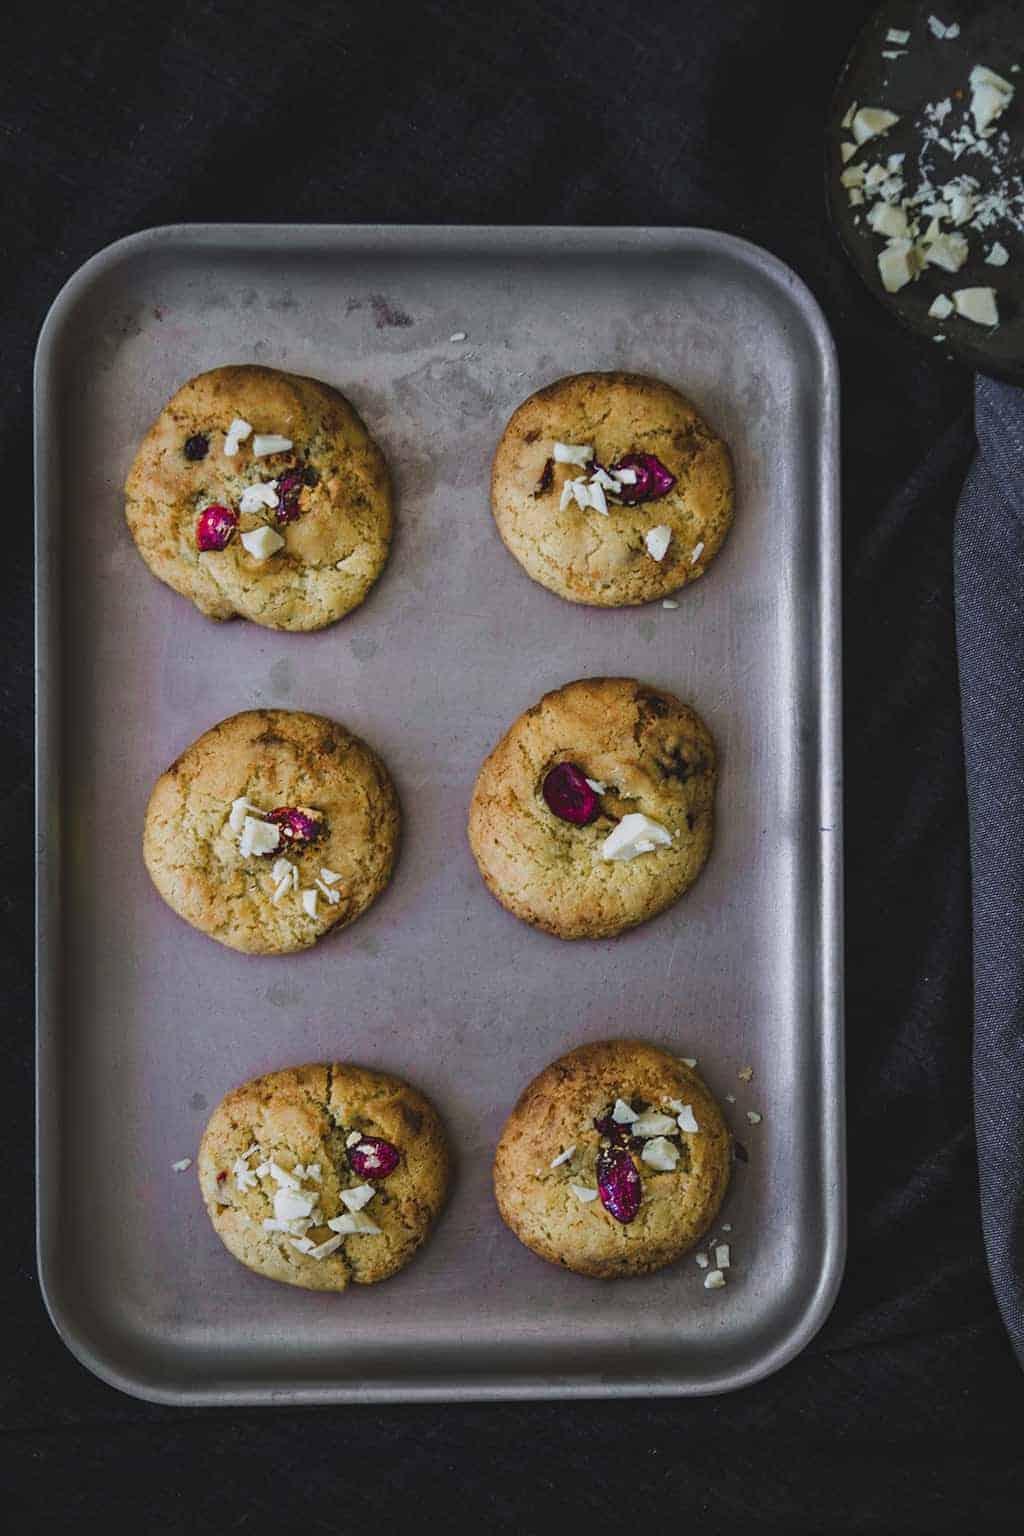 cramberry and white chocolate cookies